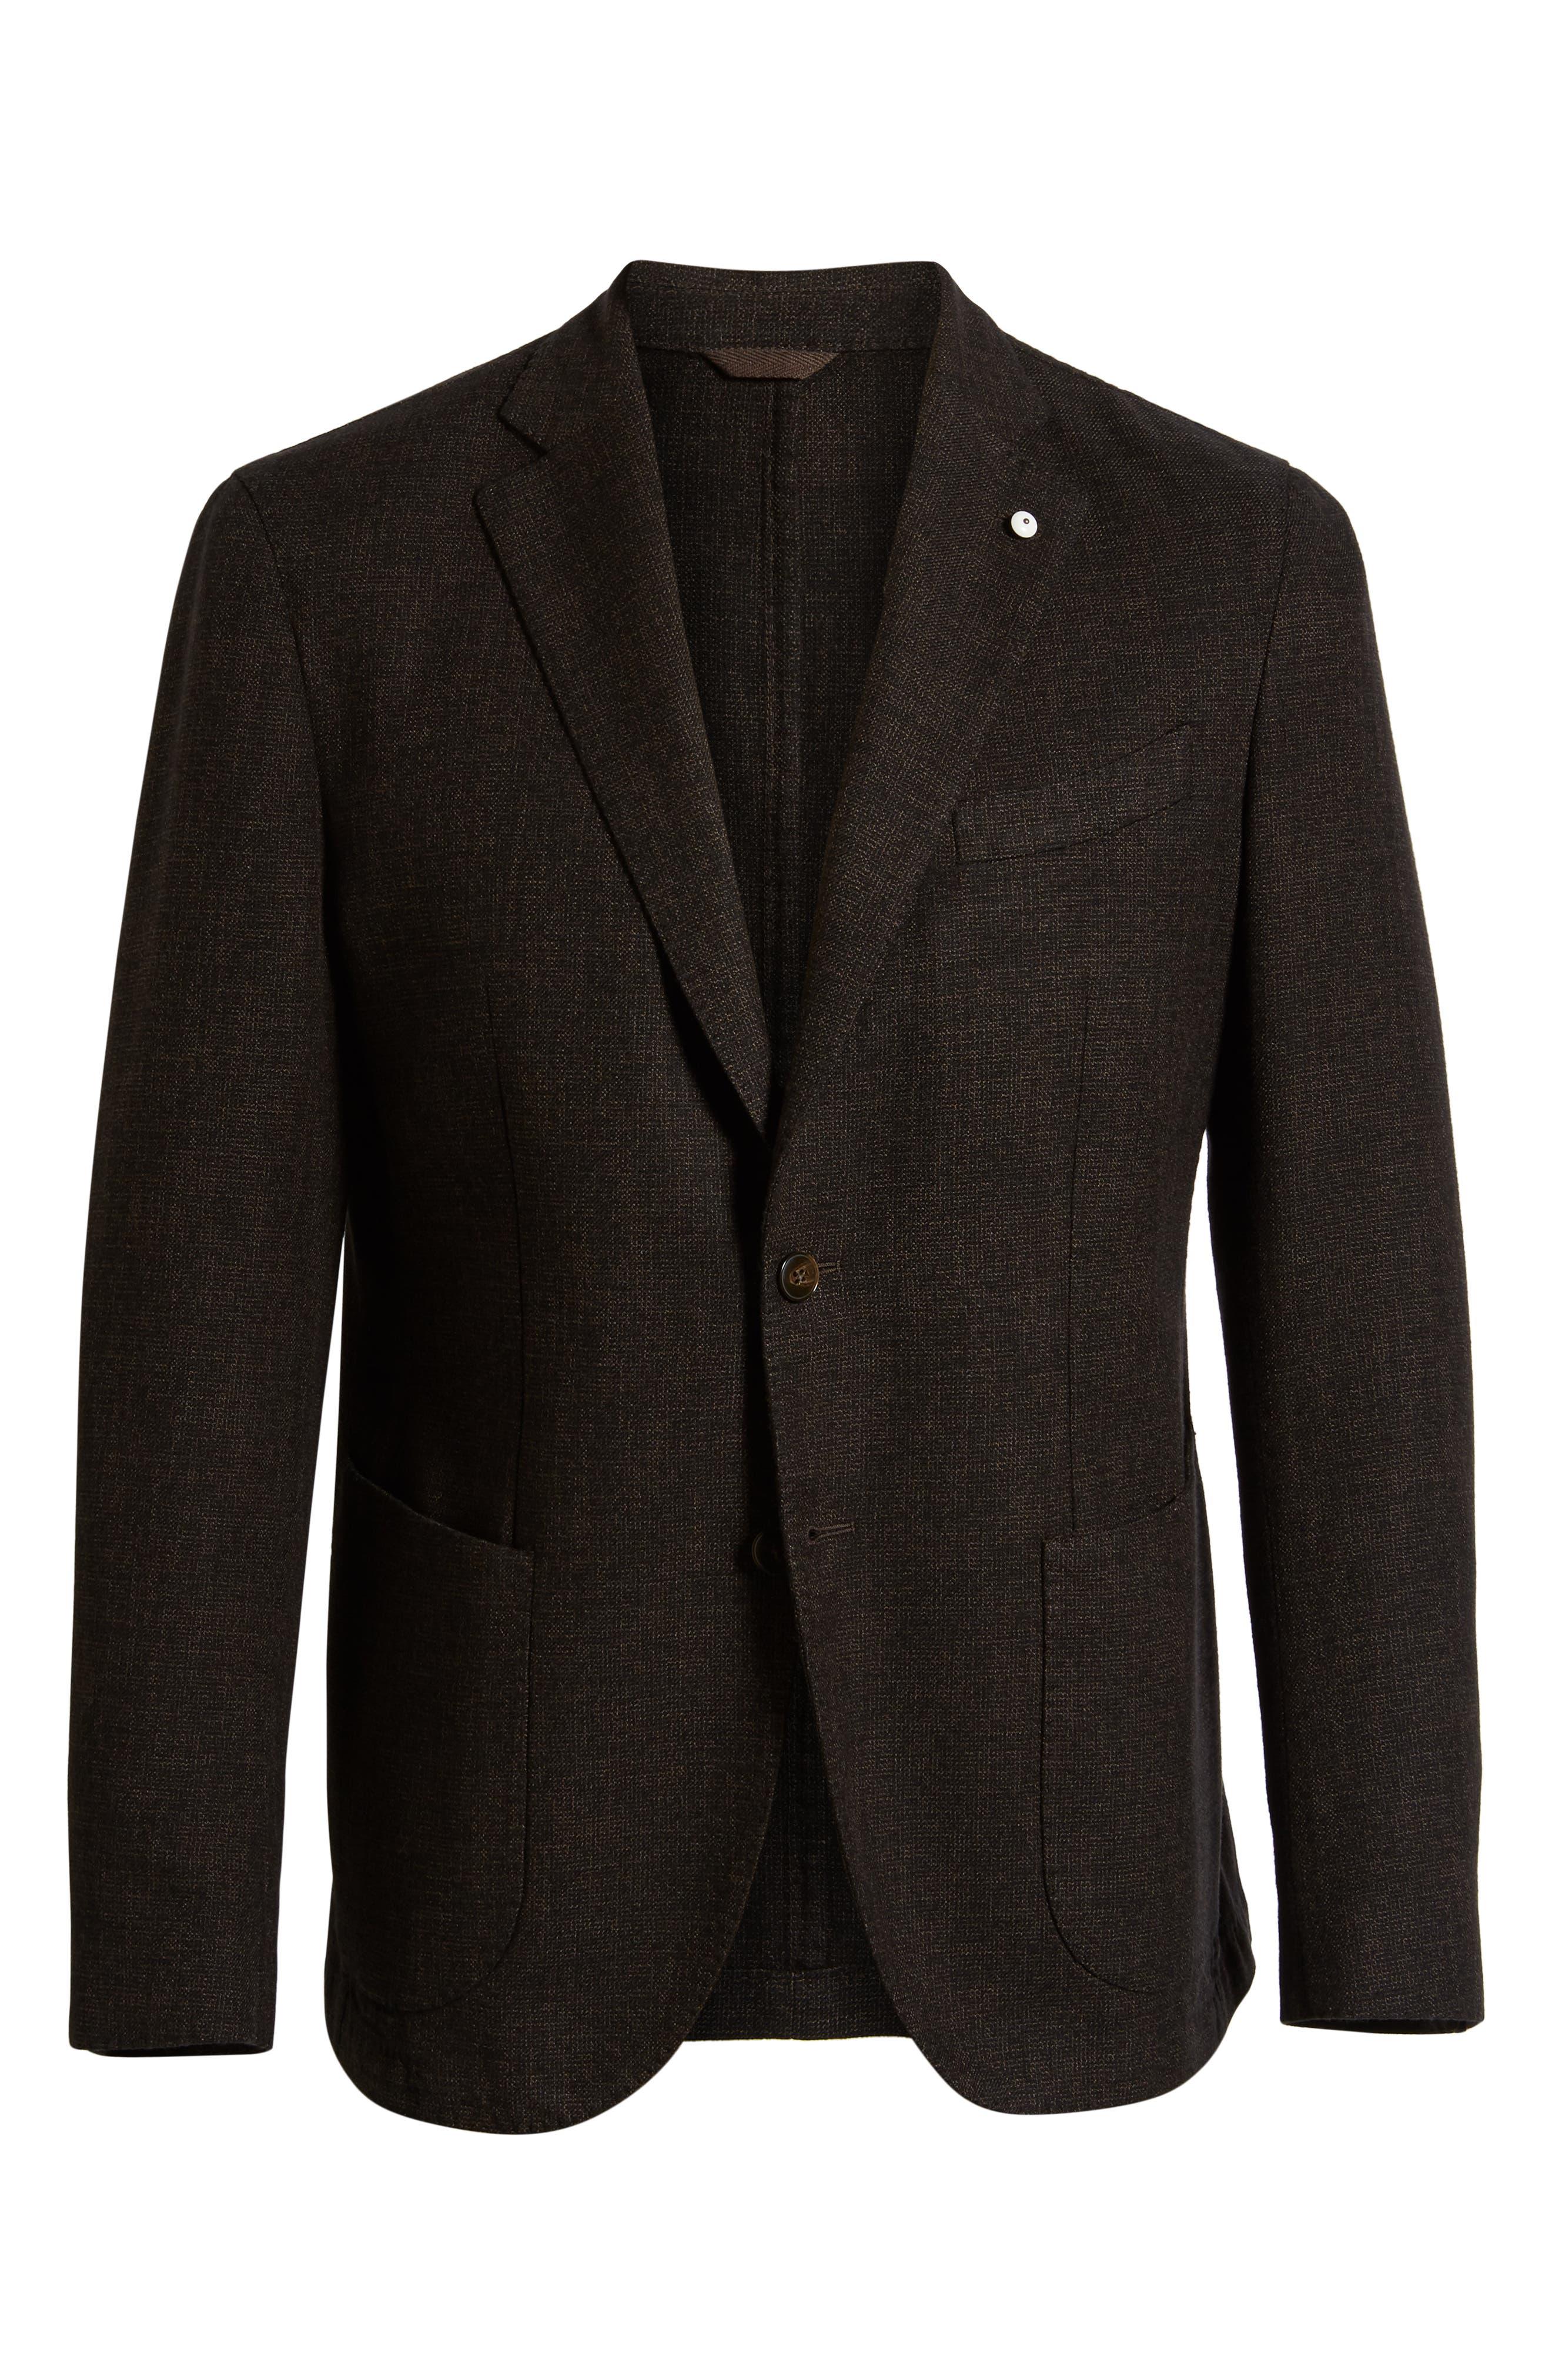 L.B.M 1911 Classic Fit Cotton & Wool Blazer,                             Alternate thumbnail 5, color,                             BROWN